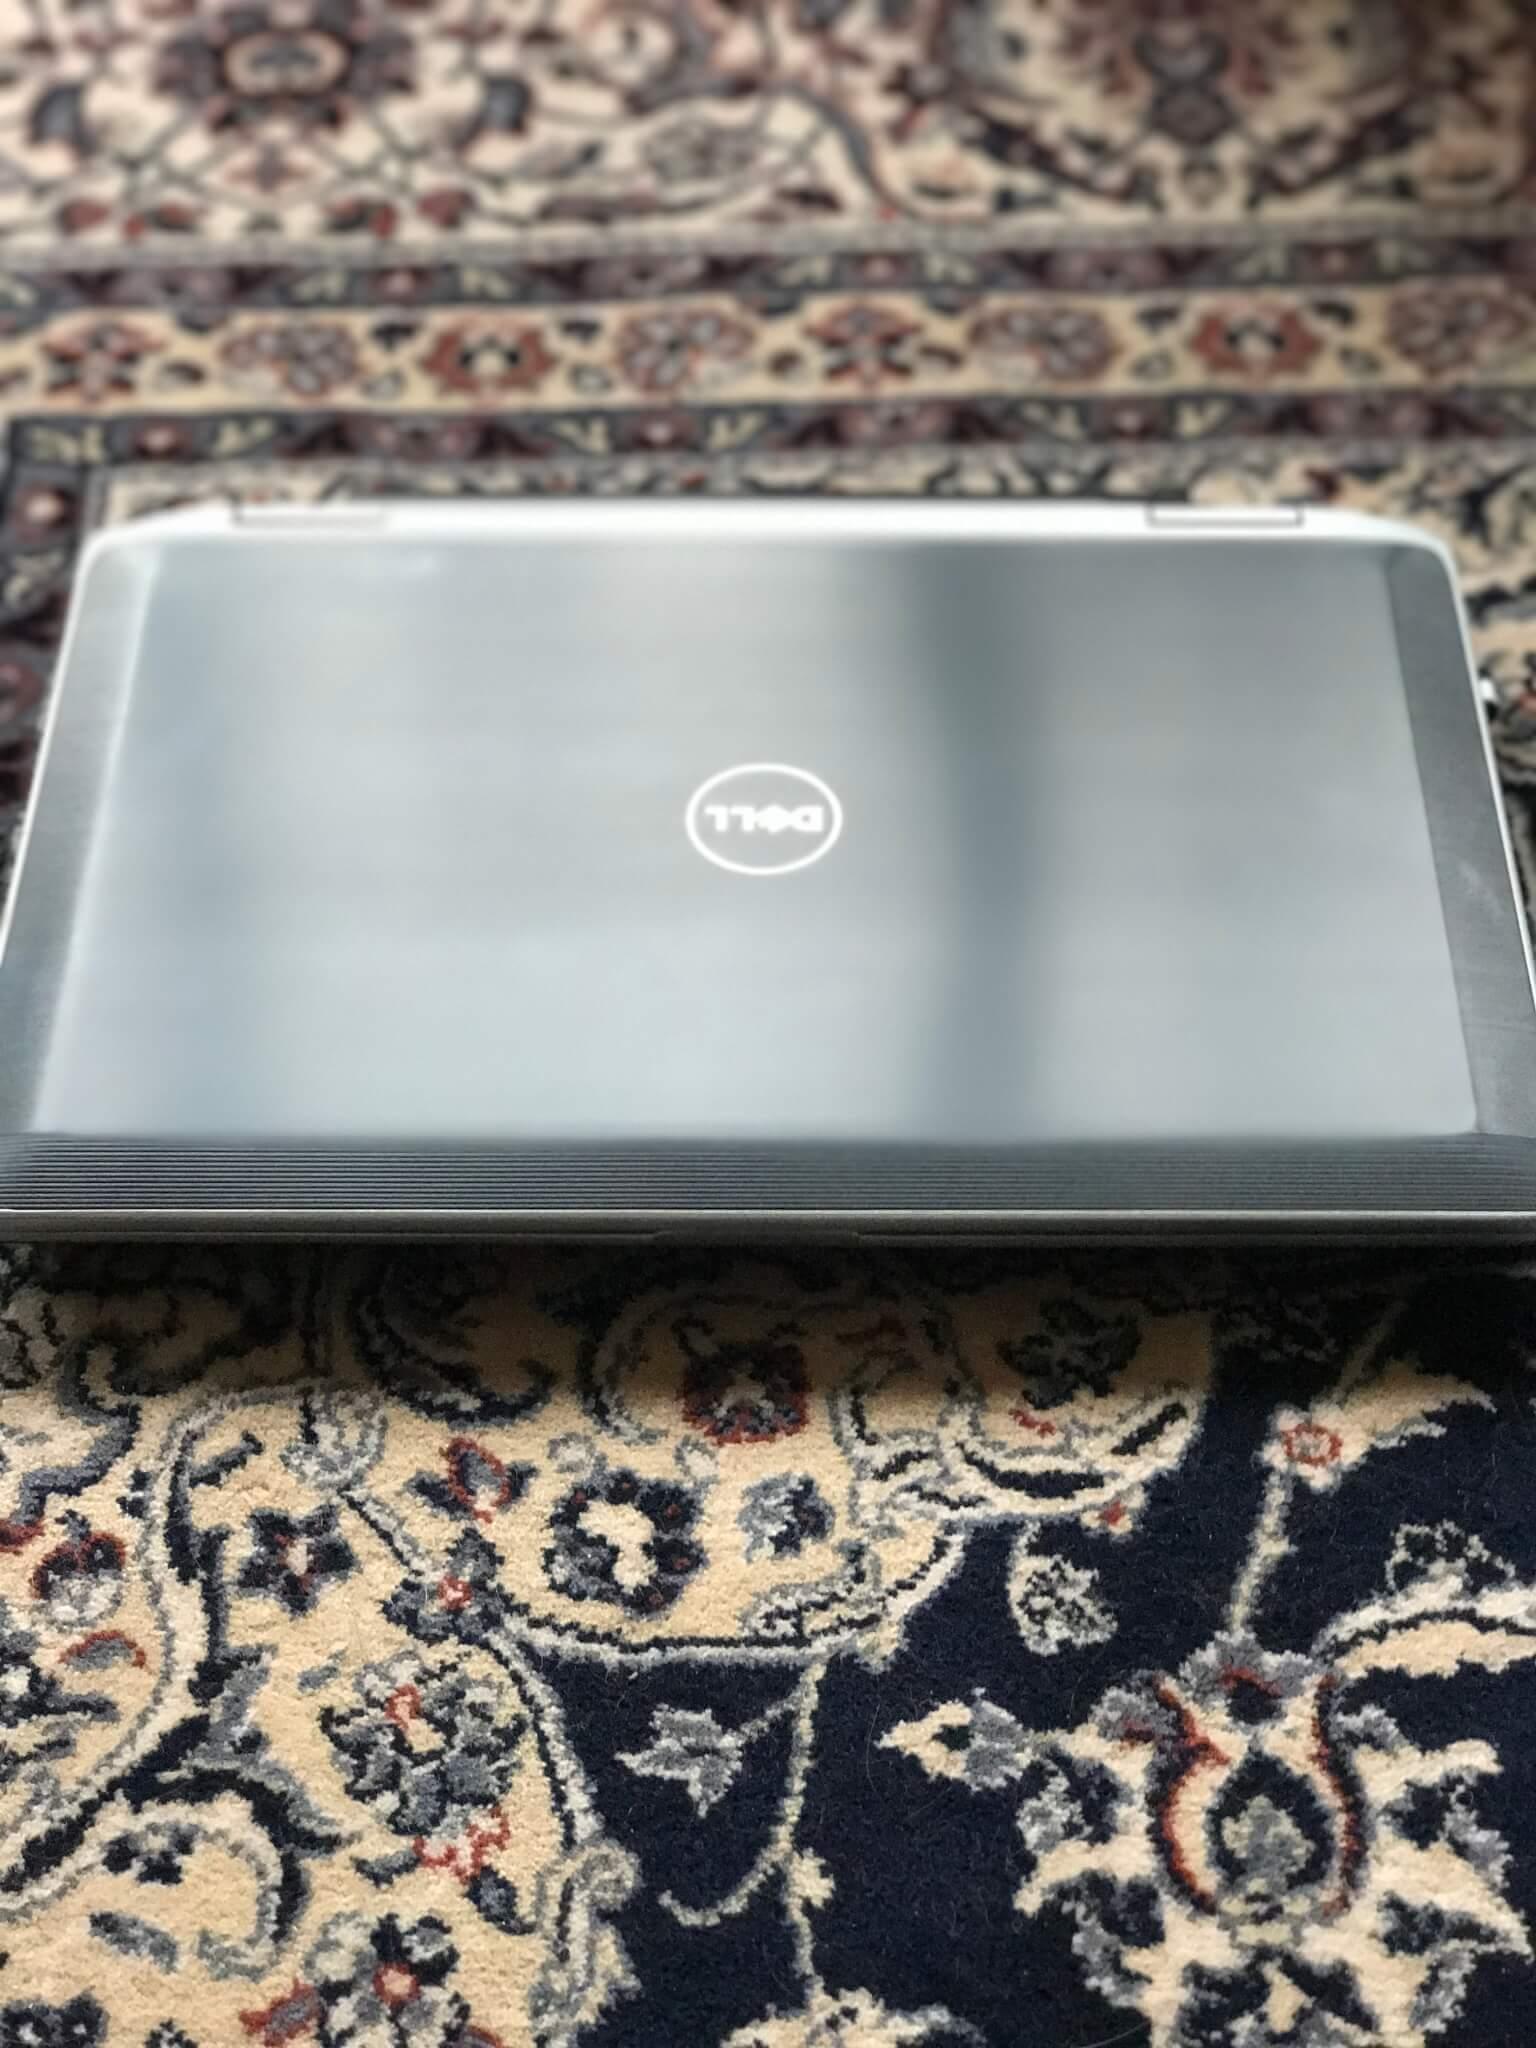 laptoprefurbished